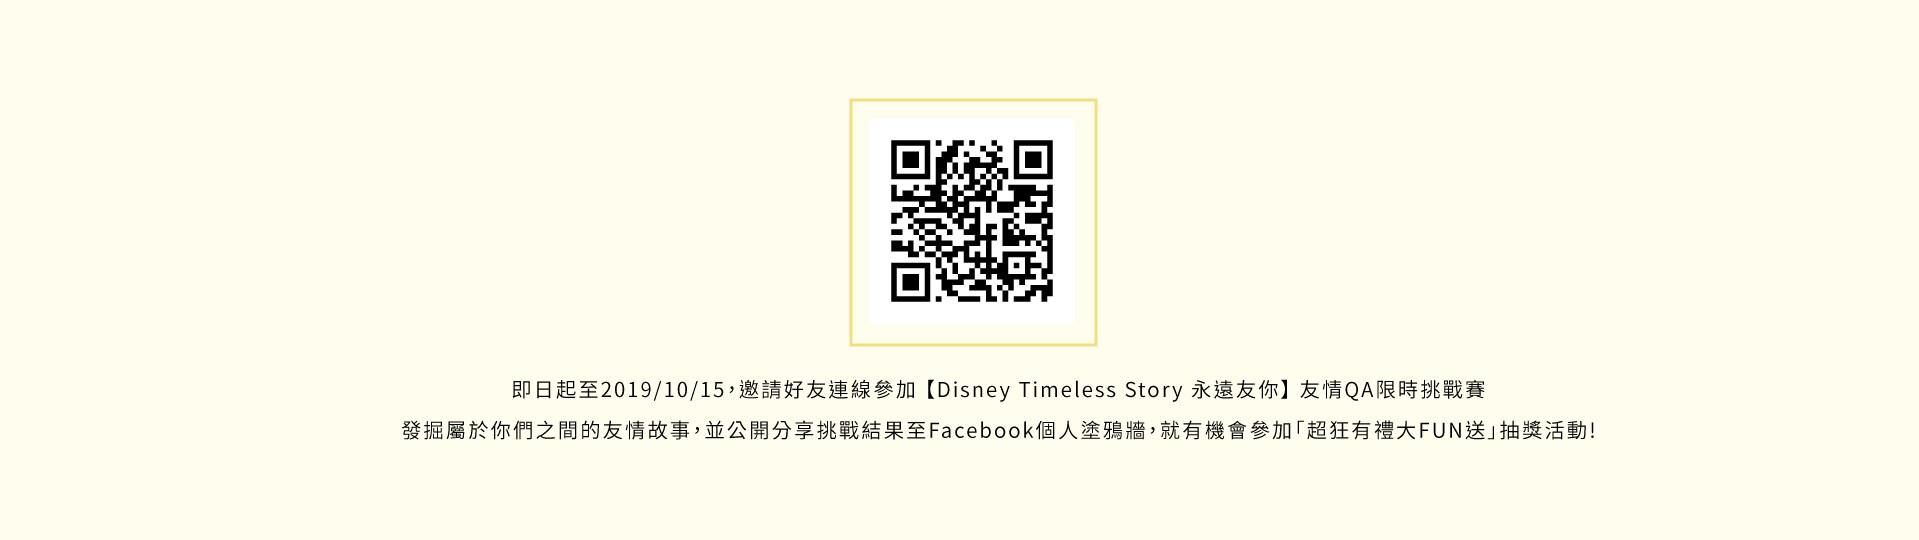 Disney Timeless Story QRcode